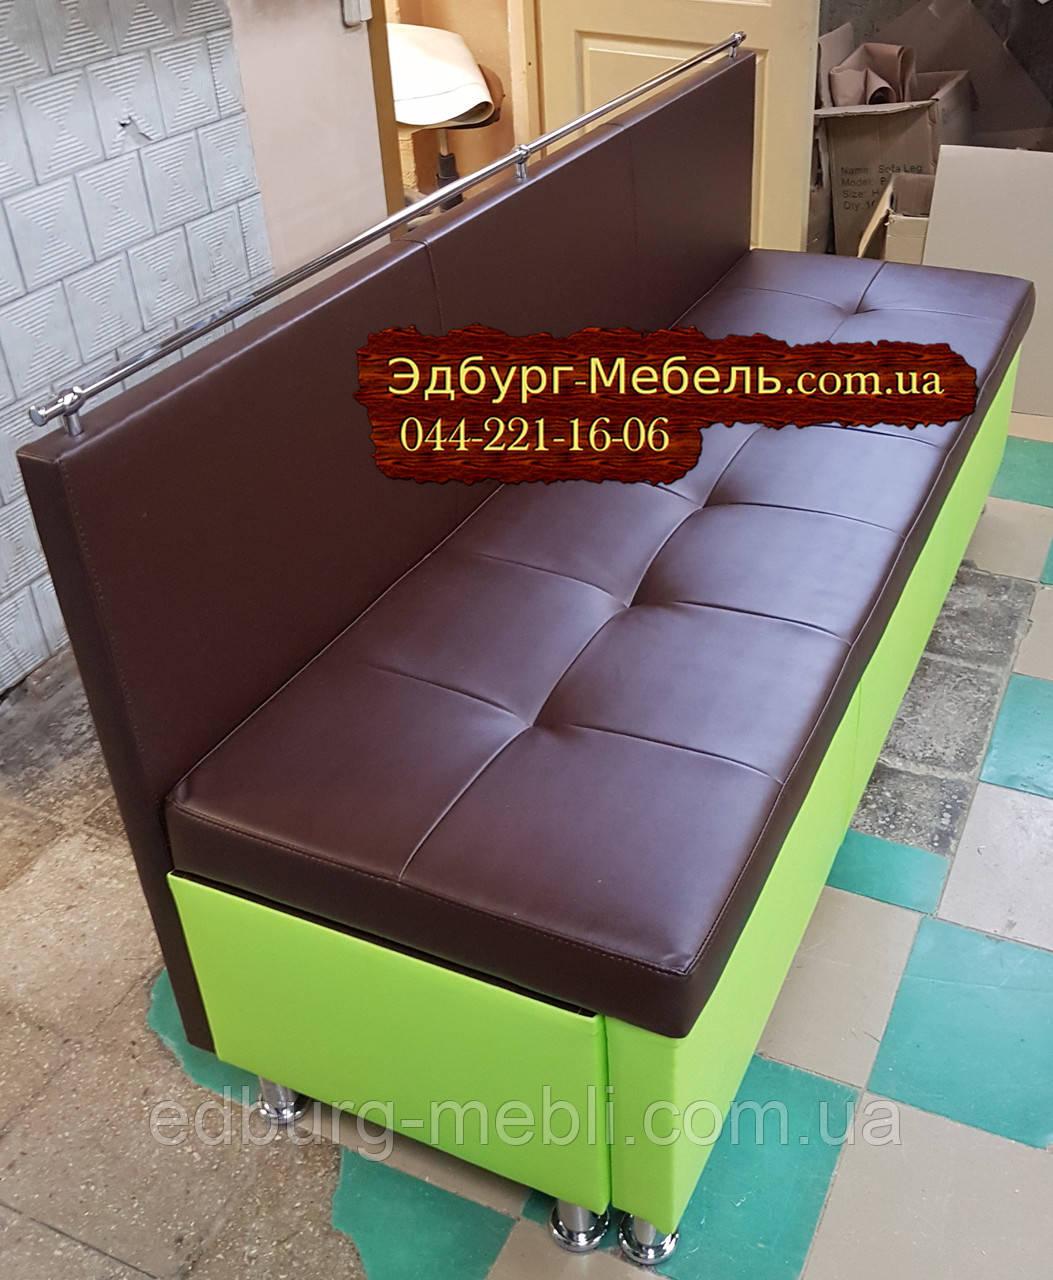 Диван для узкой кухни, коридора с ящиком + спальным местом 1800х600х850мм - фото 3